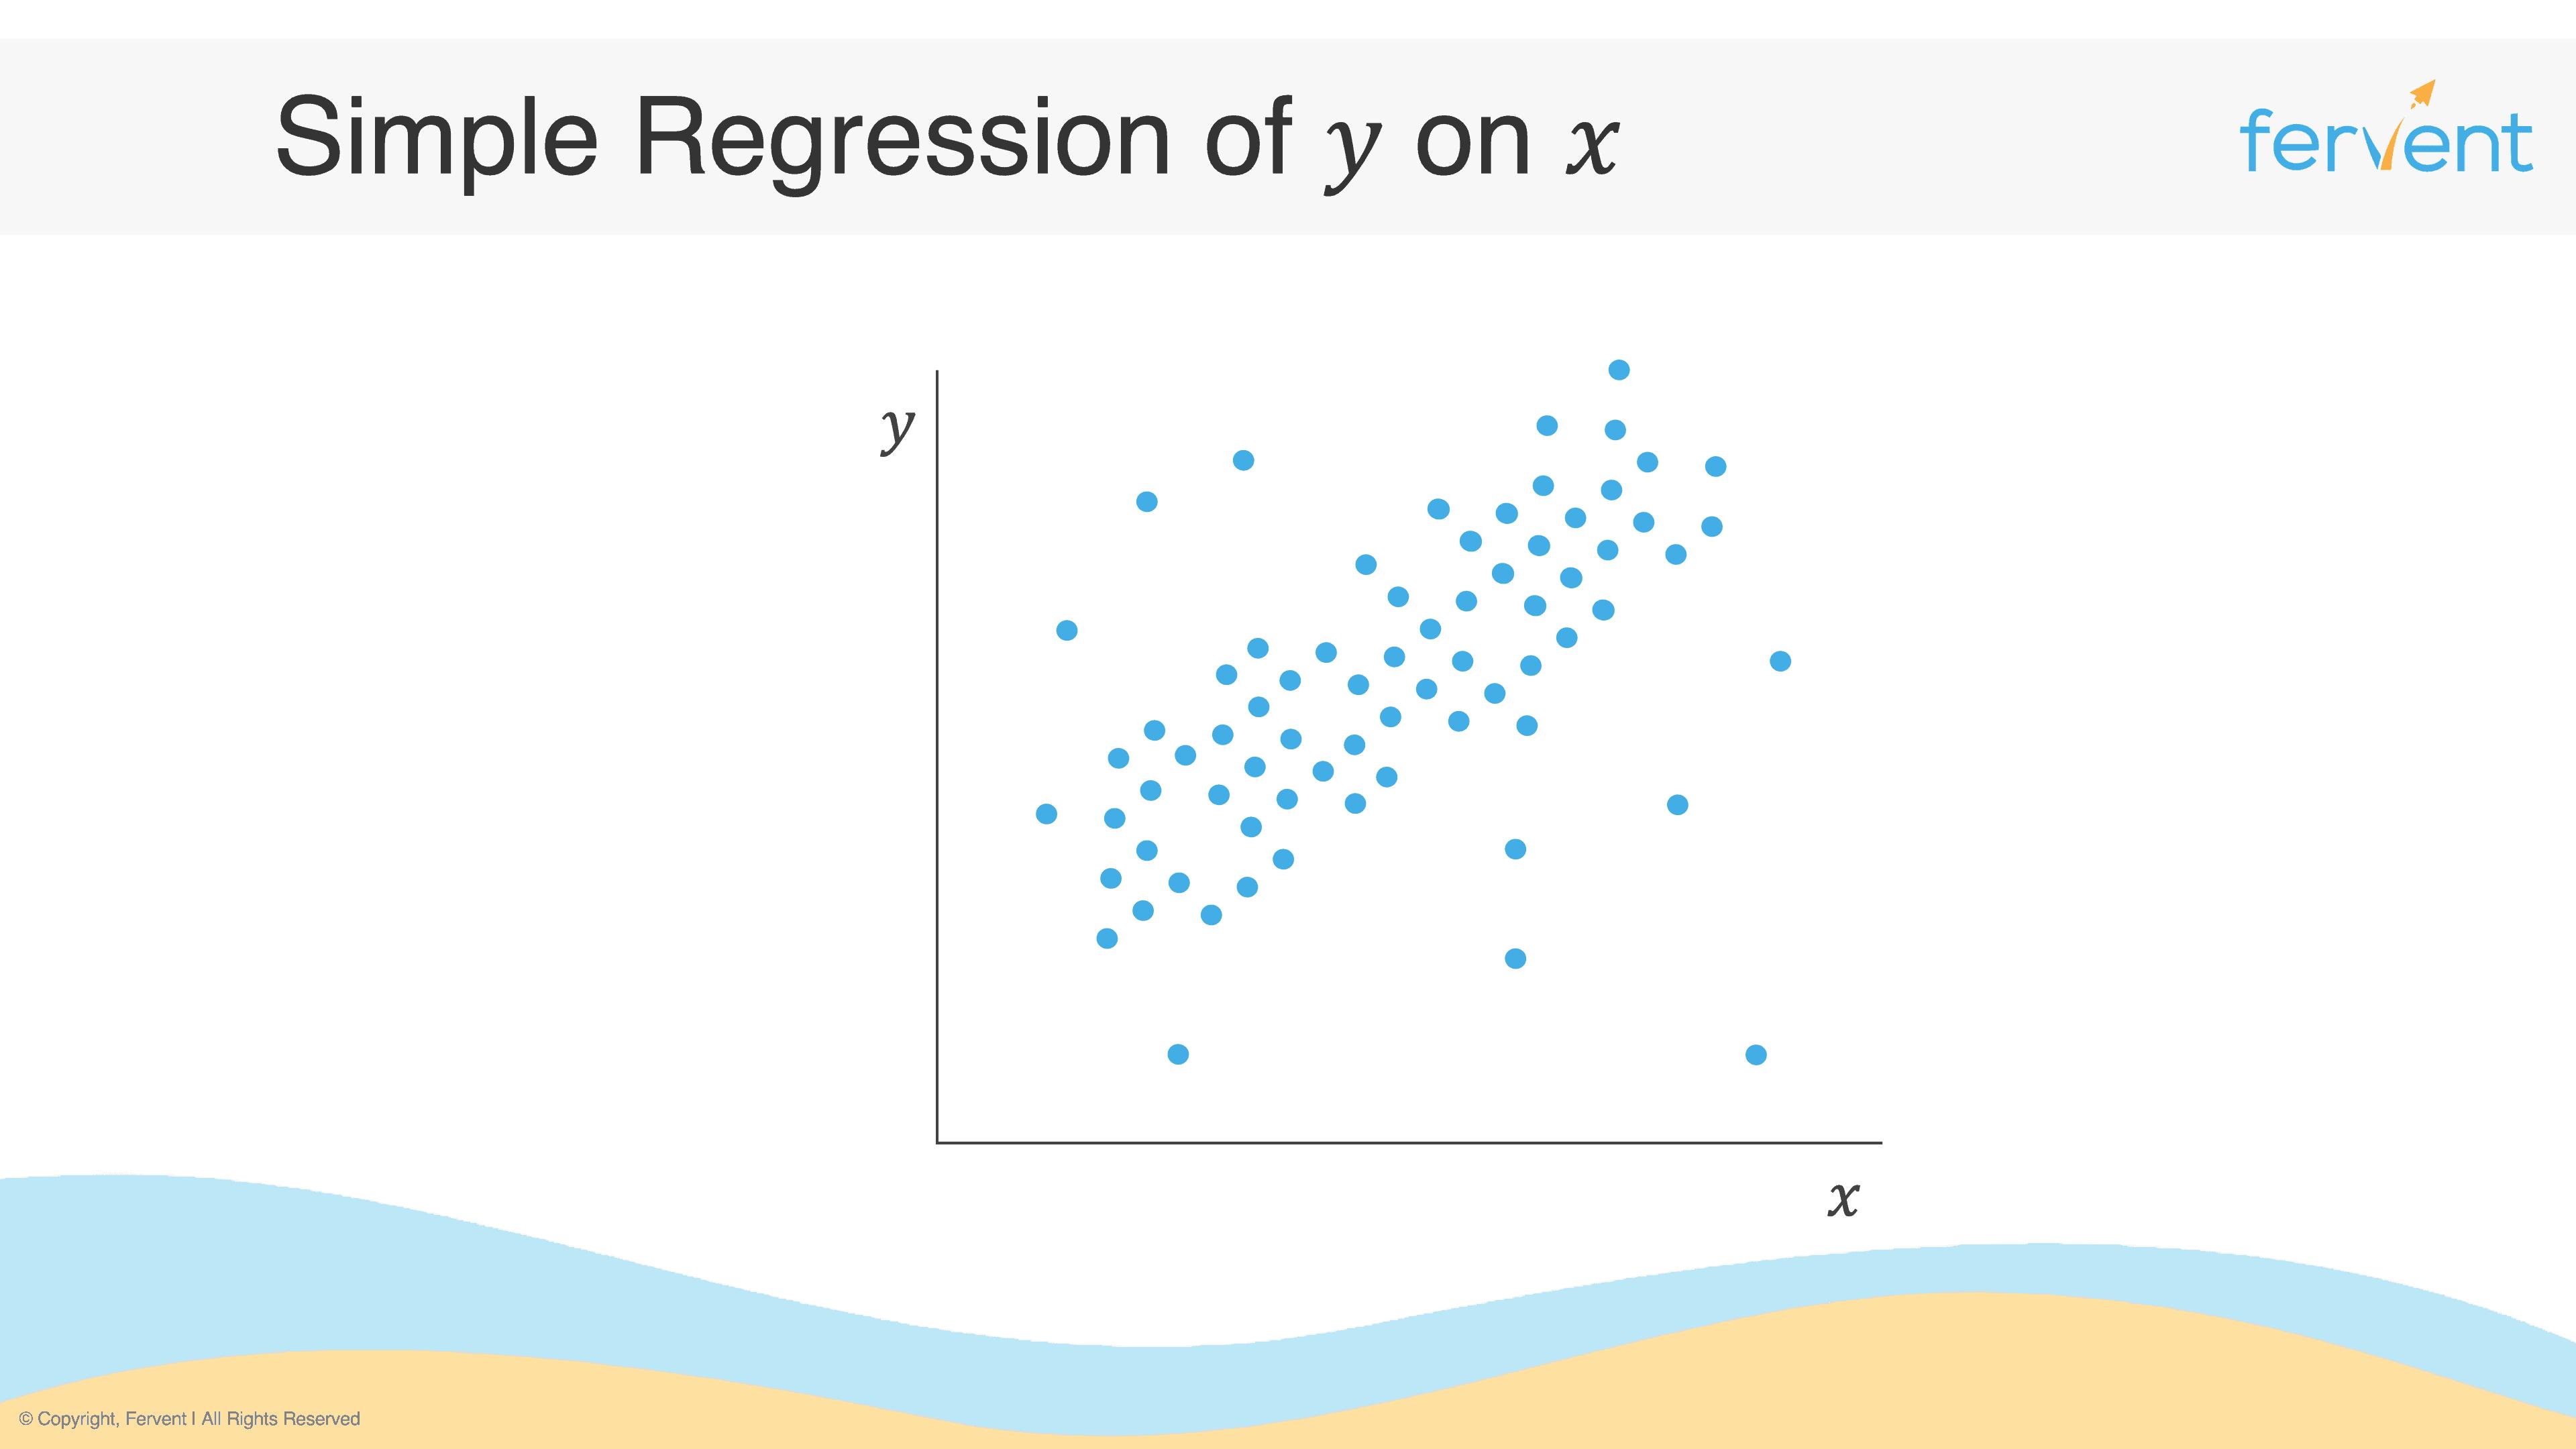 Slide showing data points